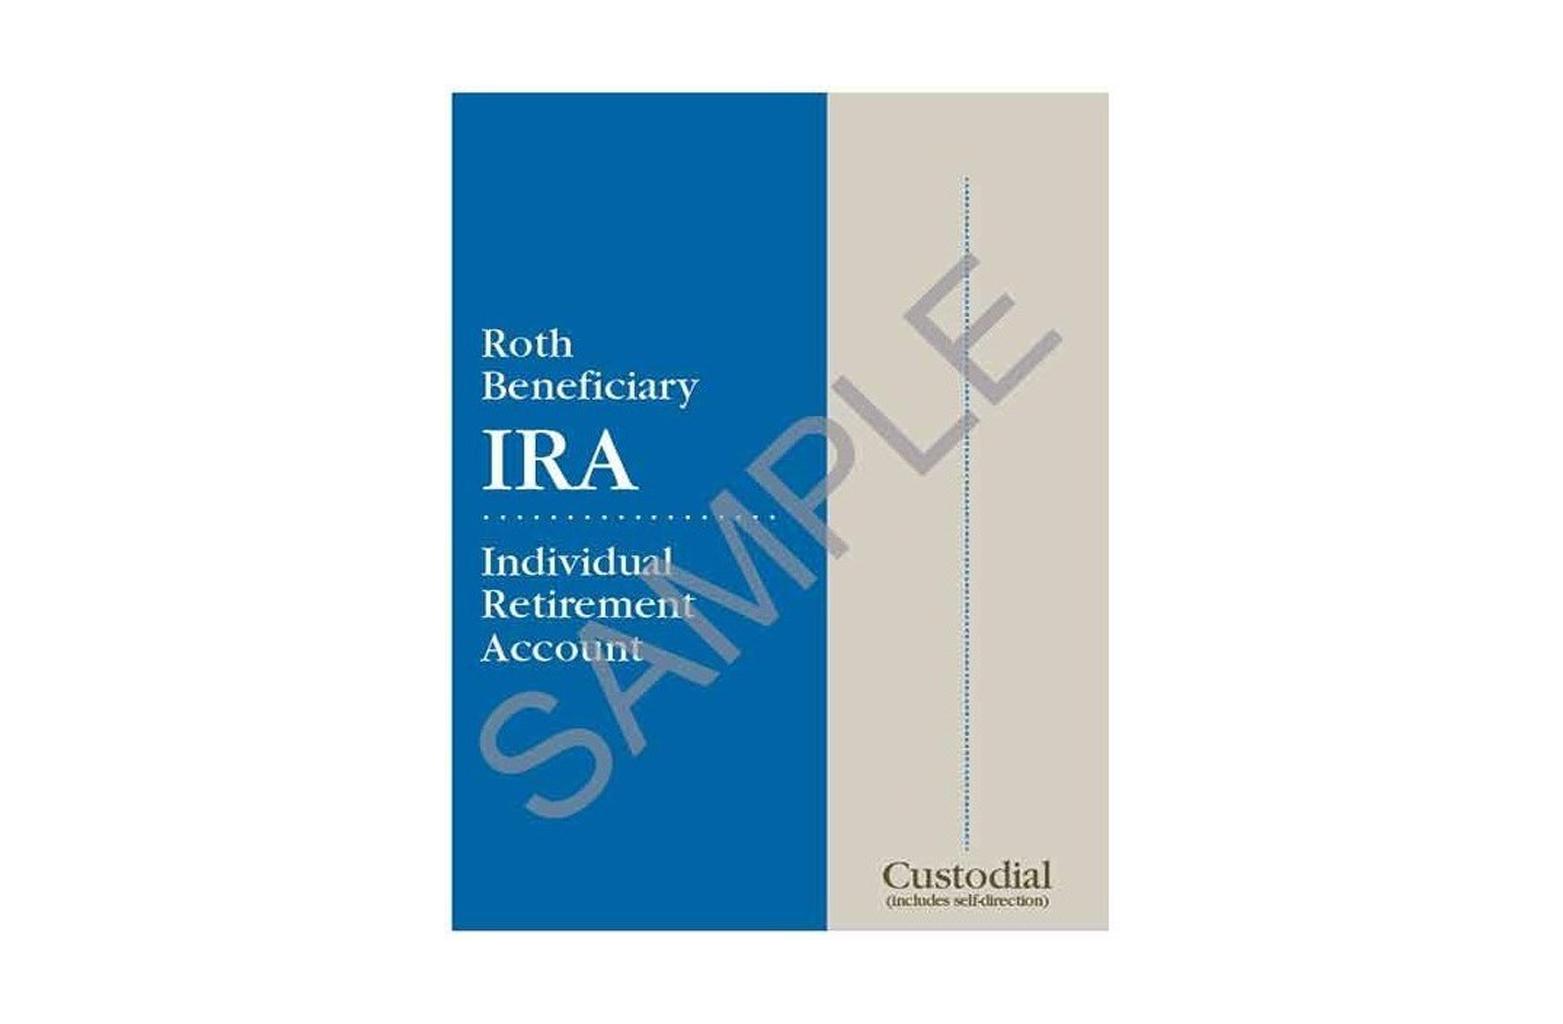 Roth Beneficiary IRA Organizer - custodial sample